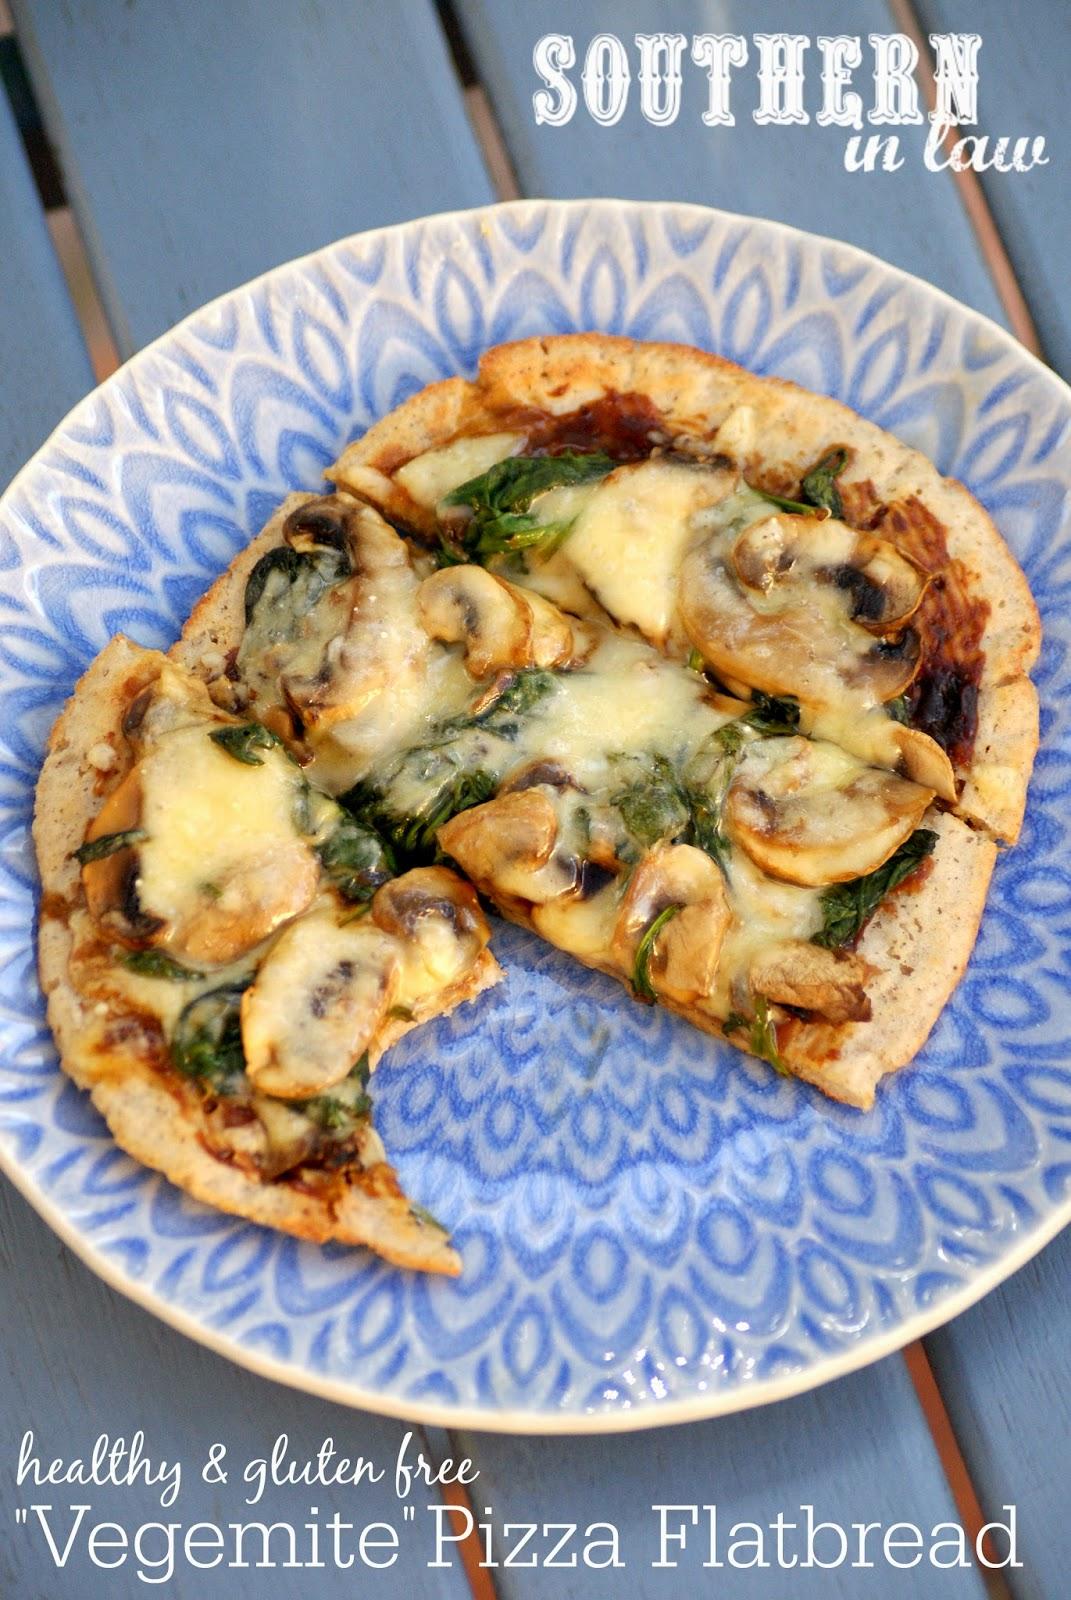 Healthy Vegemite and Cheese Pizza Flatbread Recipe - gluten free, low fat, sugar free, vegan, egg free, dairy free